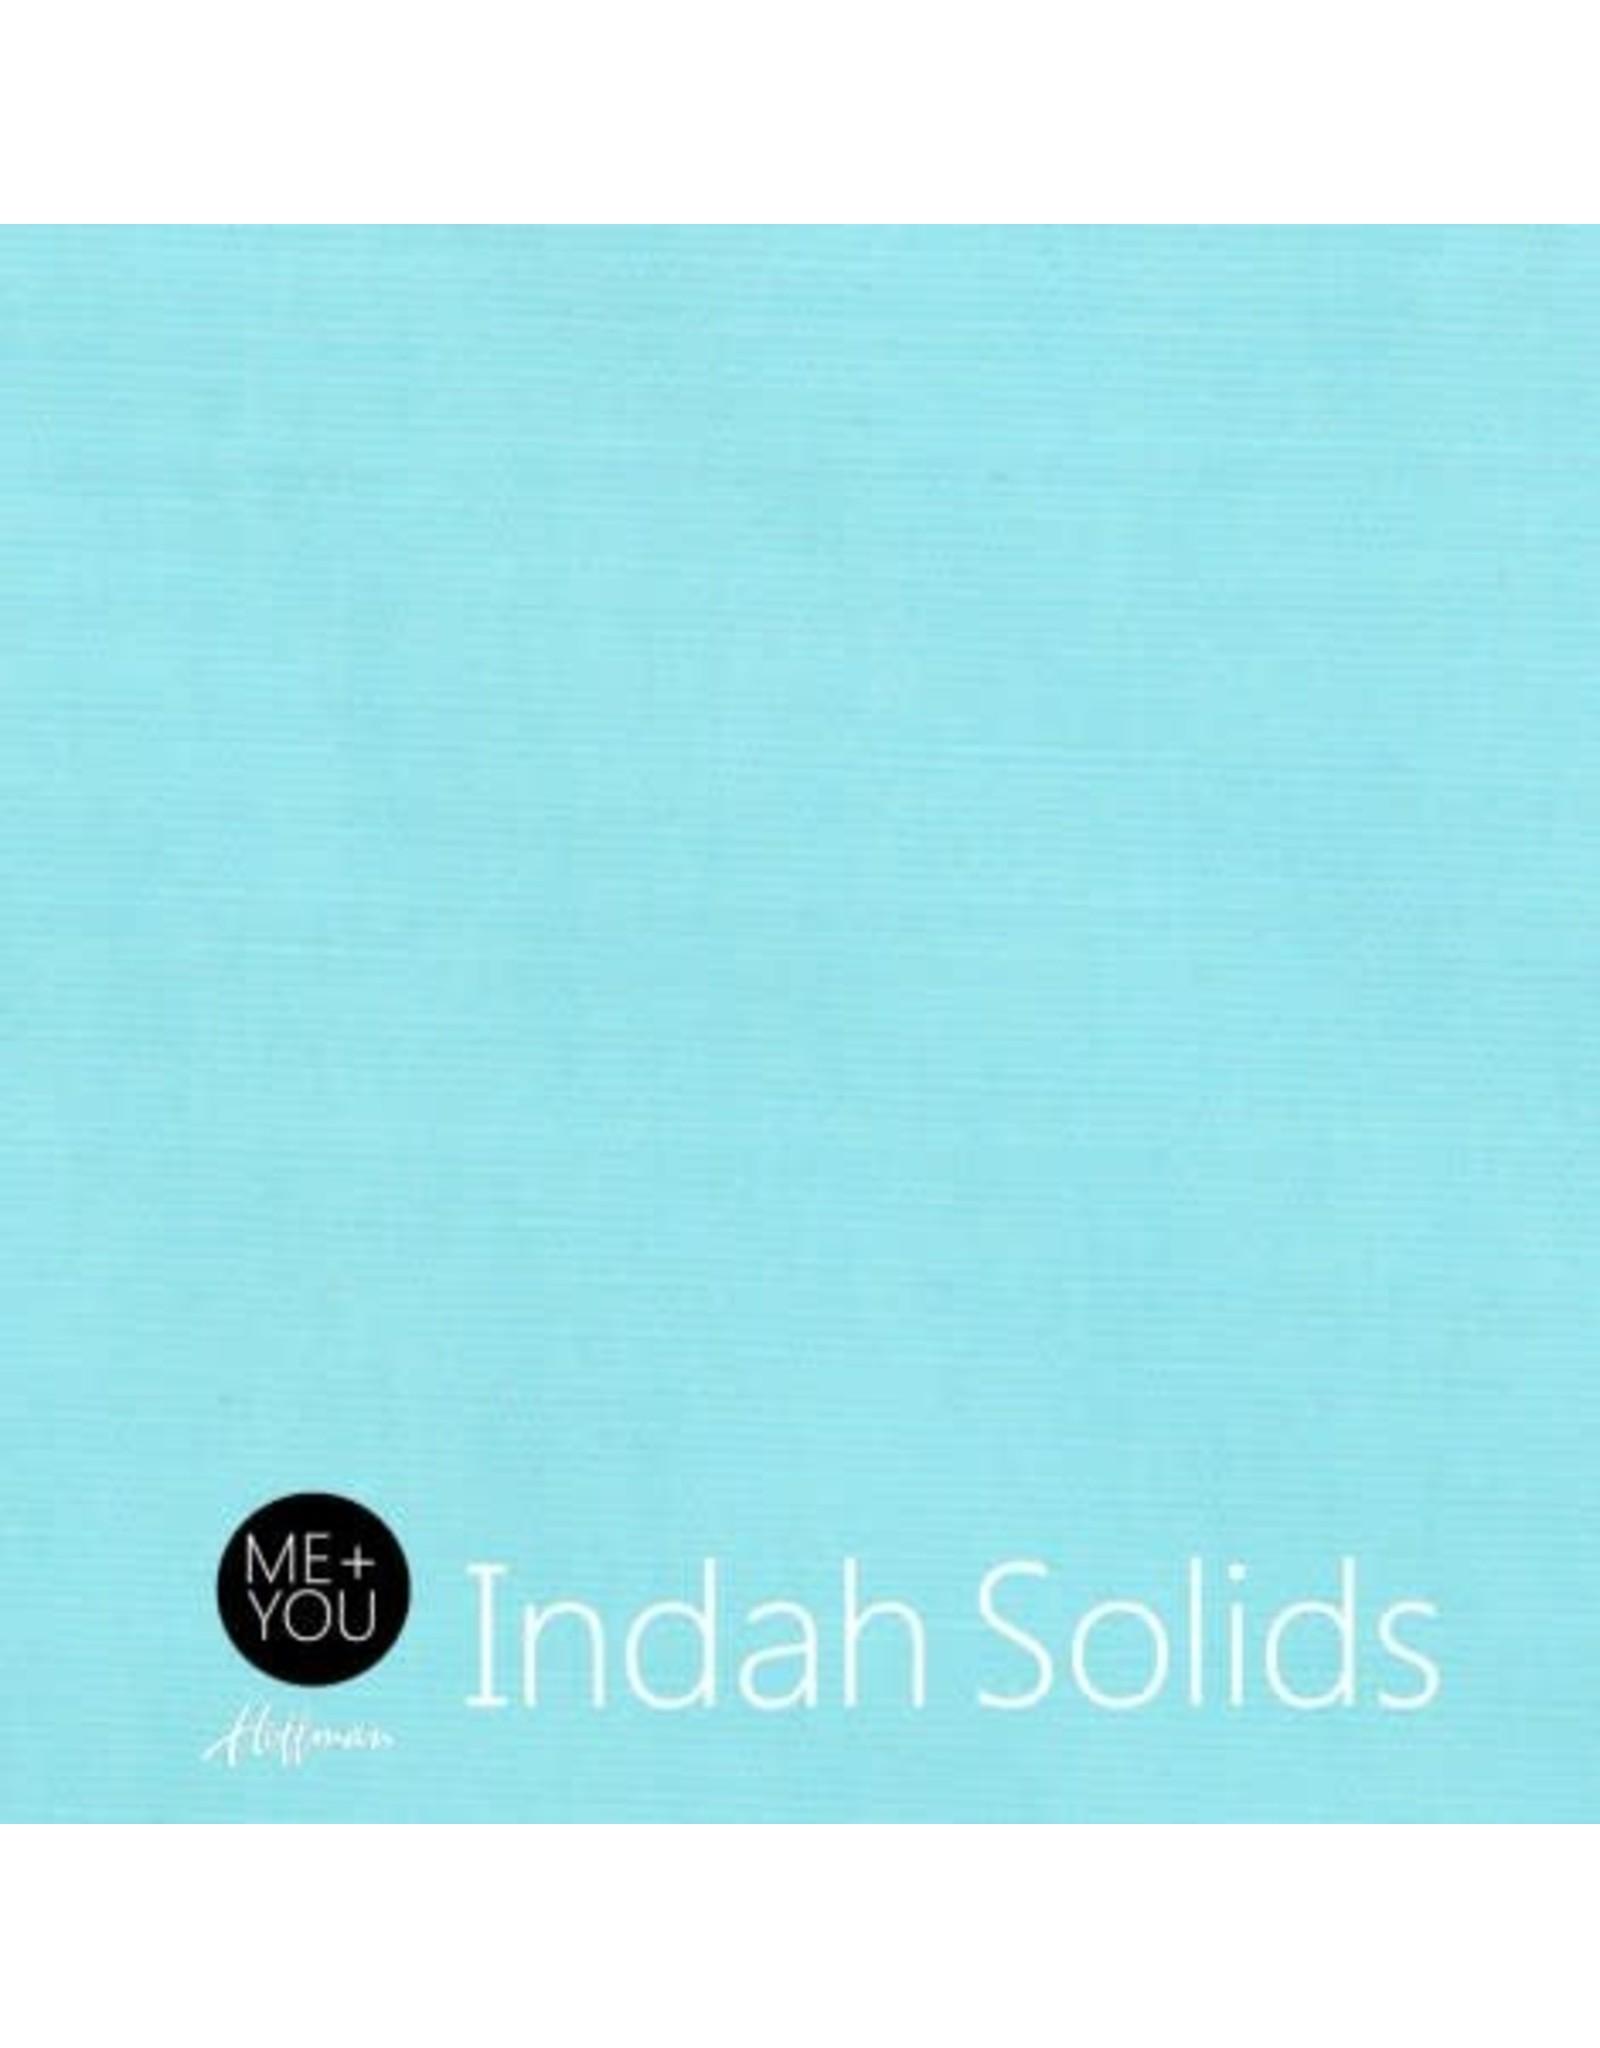 Me+You by Hoffman Fabrics Indah Solids - Seaglass